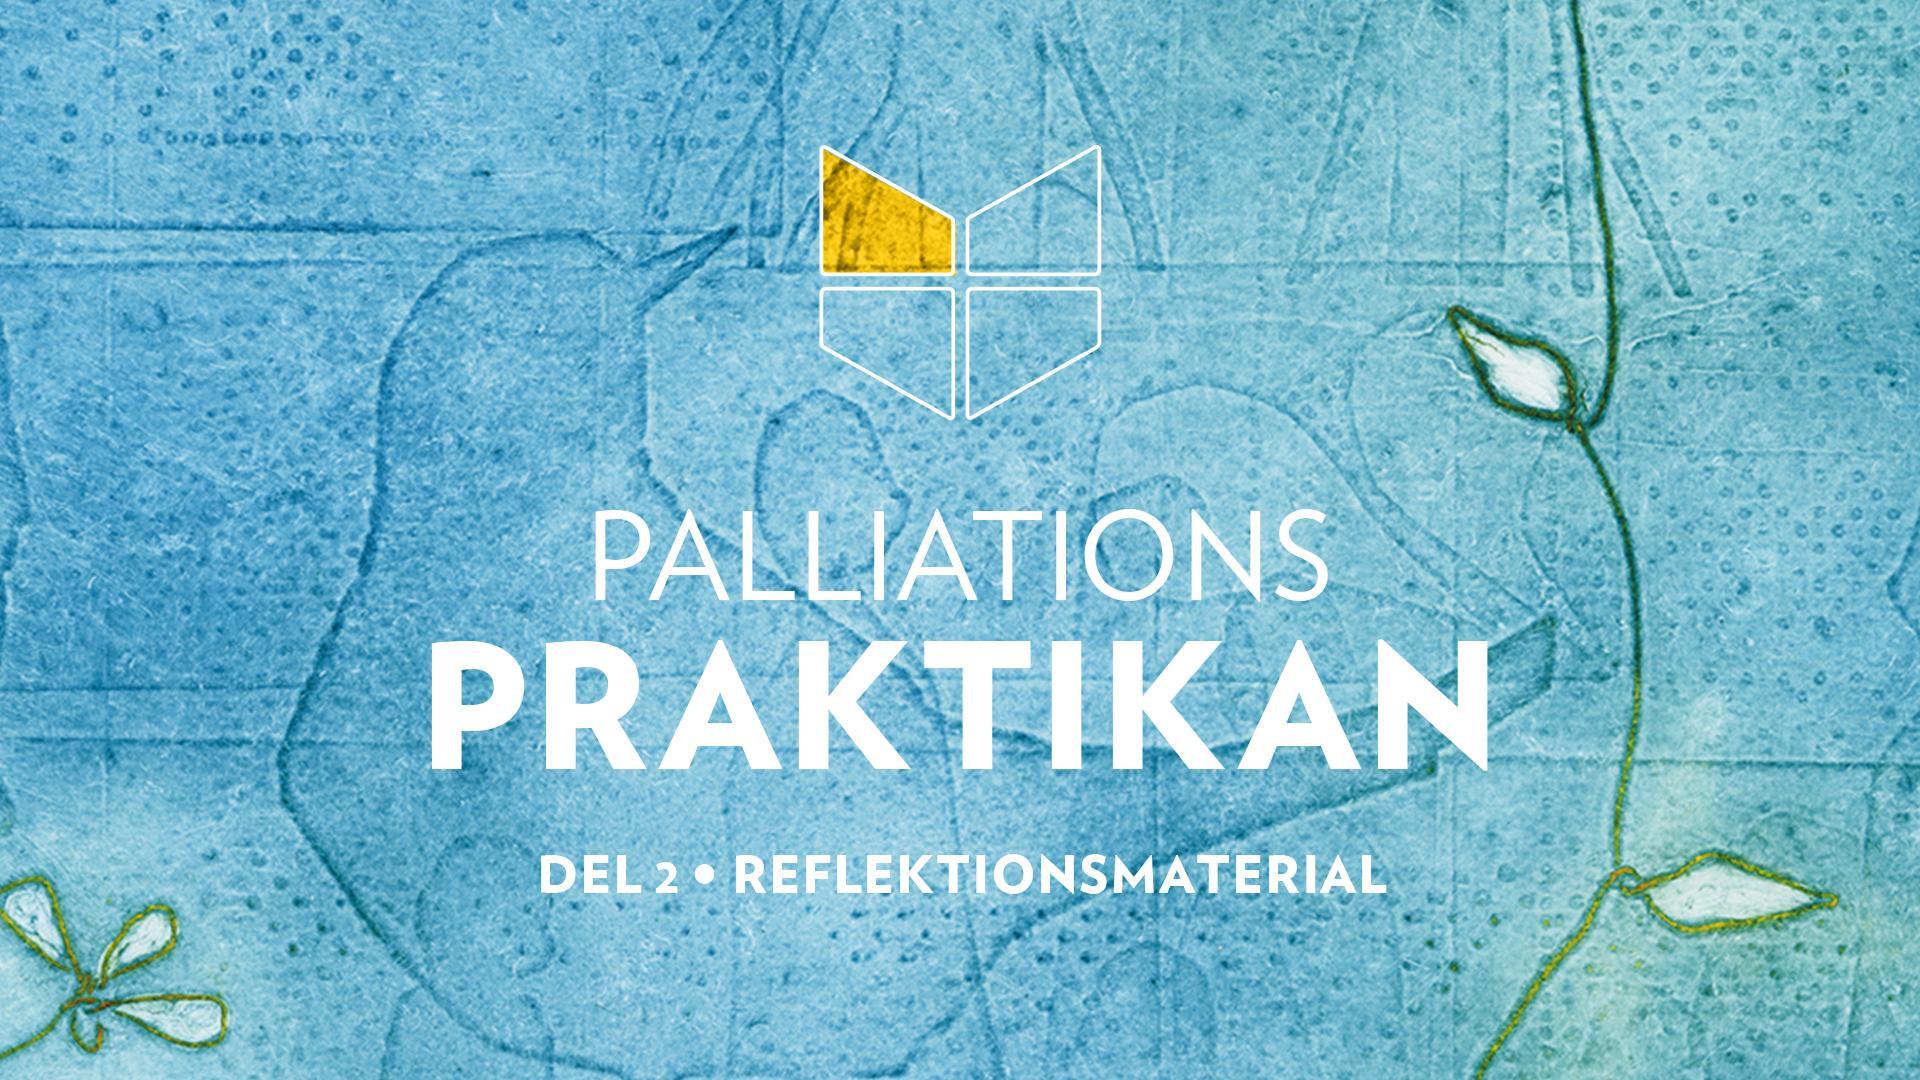 Palliationspraktikan del 2 - Kapitel 11: Karin Thunberg; Hoppet